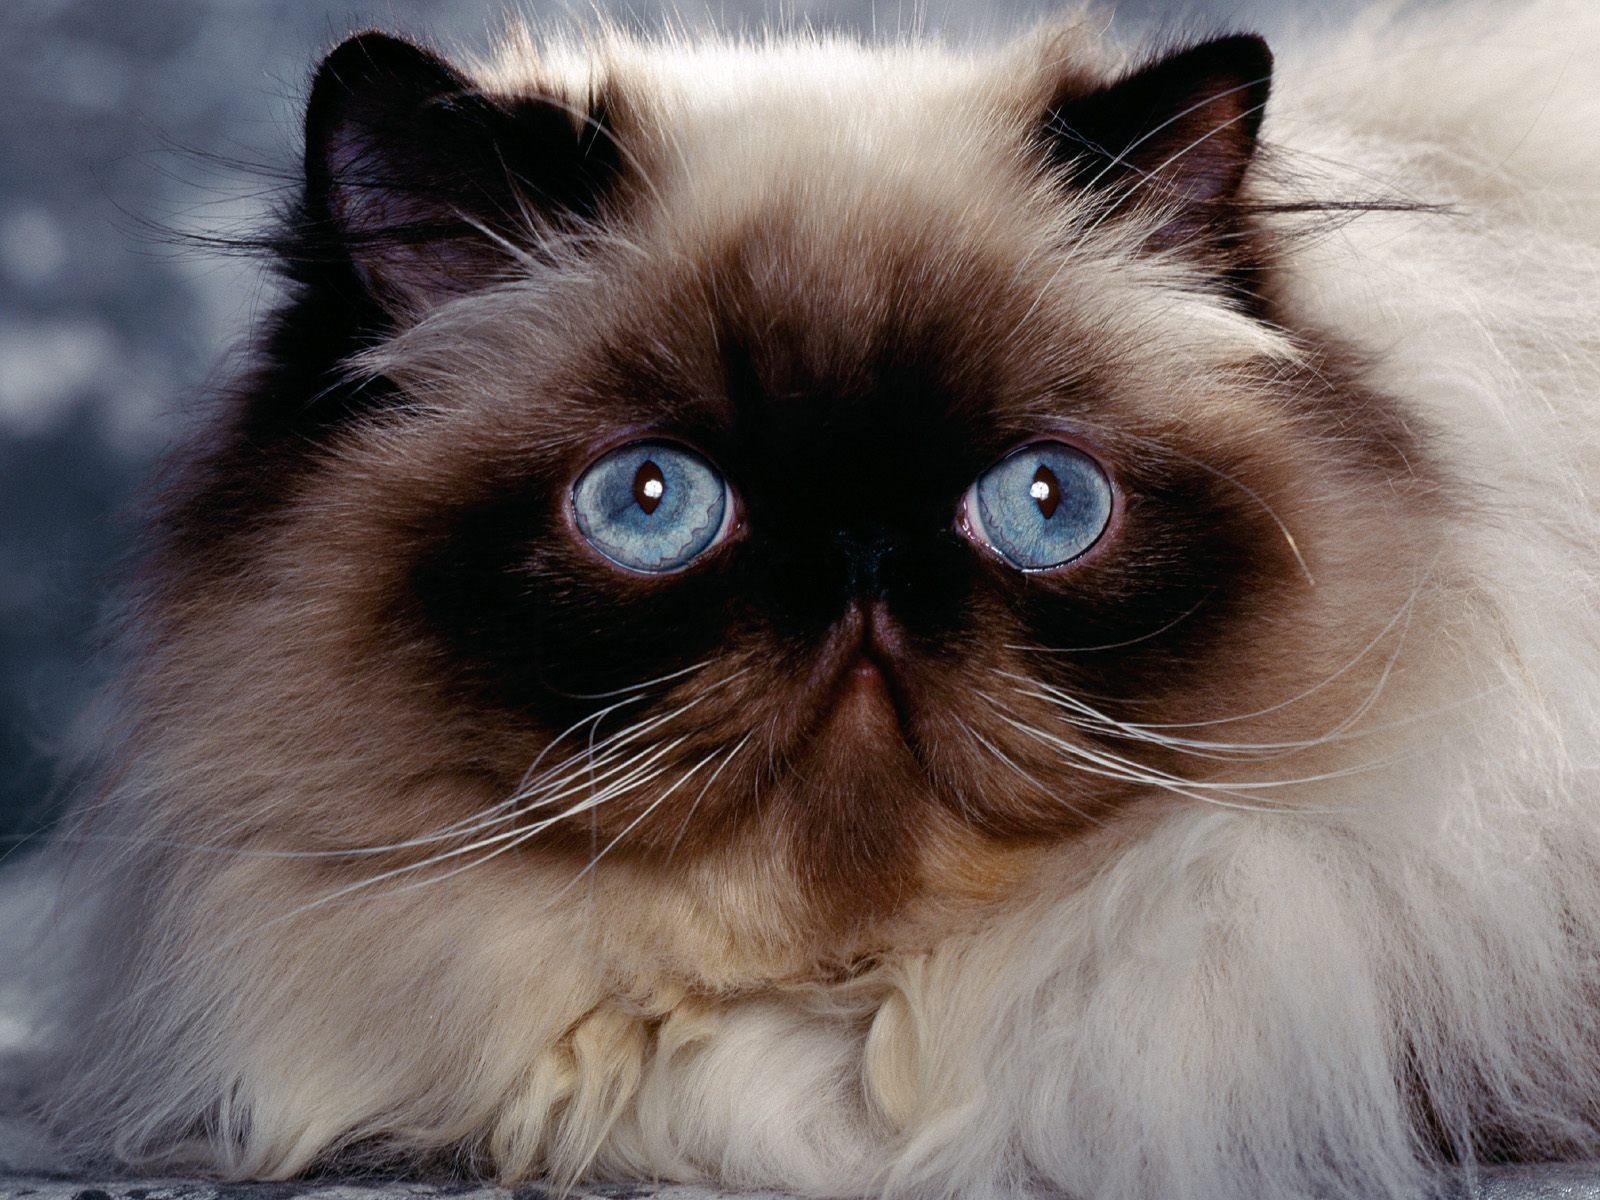 http://3.bp.blogspot.com/_-mY2ck9YCeE/TSxdnJ-E3xI/AAAAAAAADCQ/7EAaBQzHMPg/s1600/Himalayan_Persian_Cat.jpg